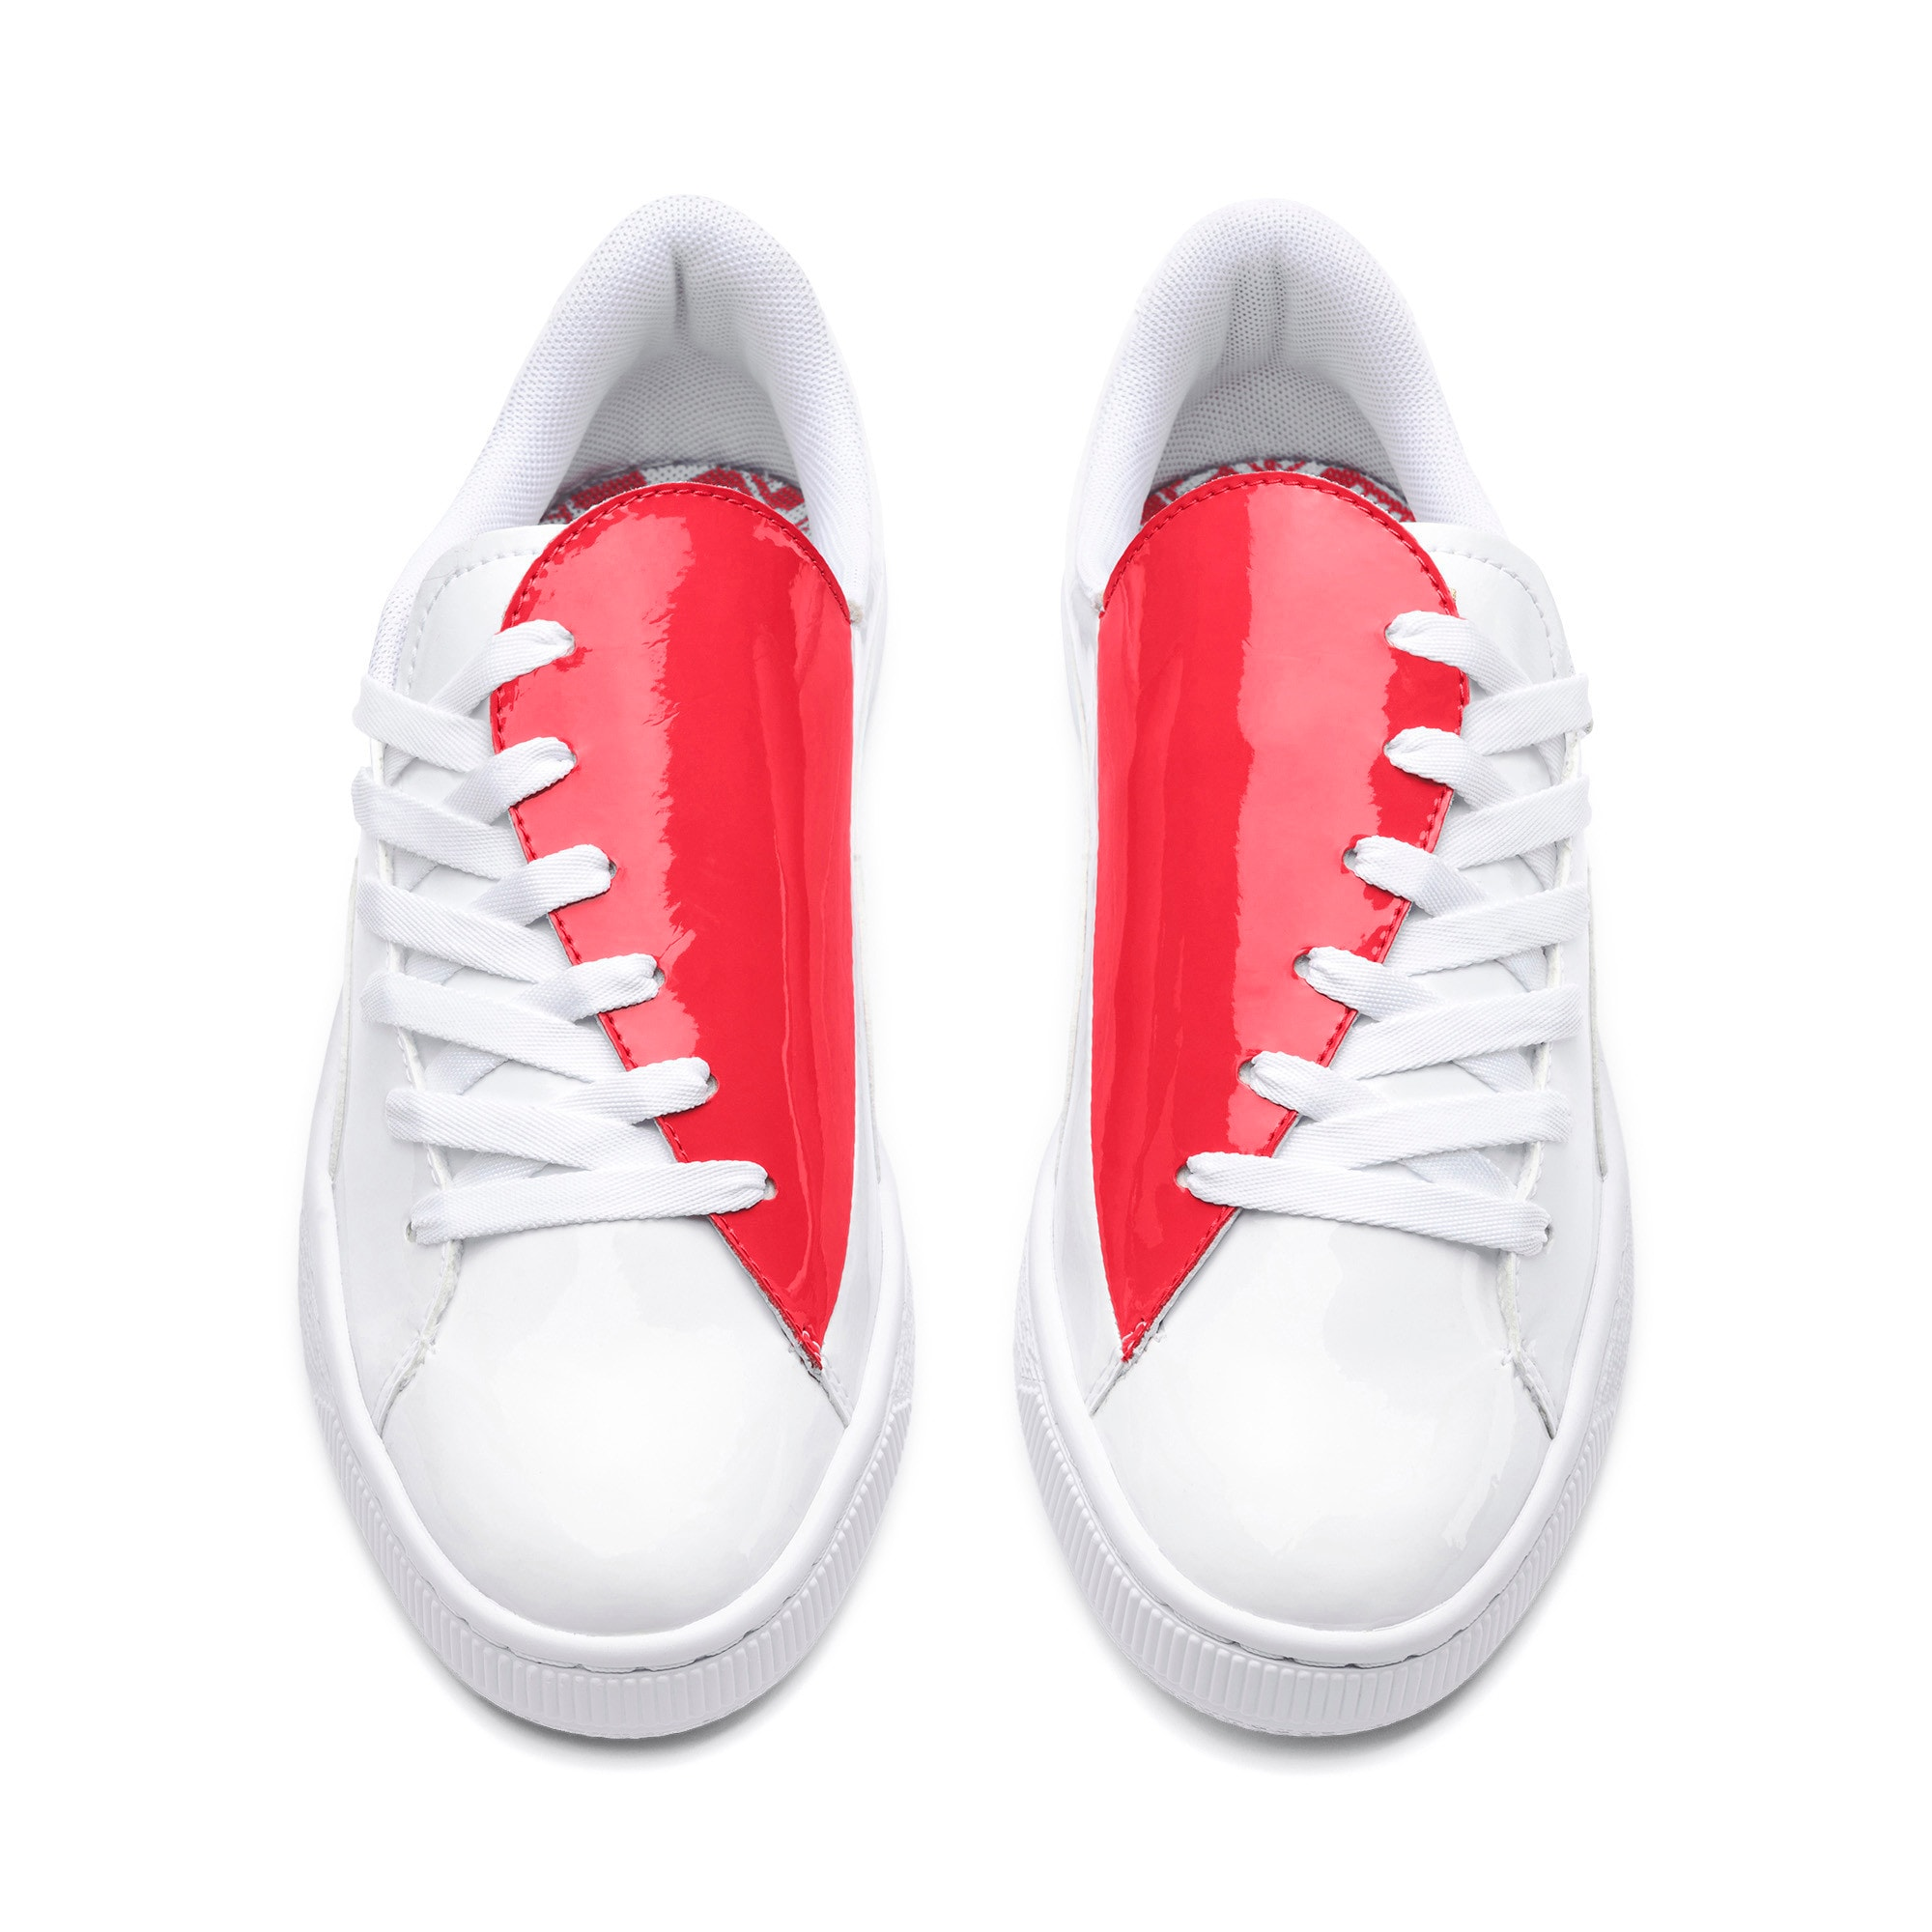 Thumbnail 3 of Basket Crush Women's Sneakers, Puma White-Hibiscus, medium